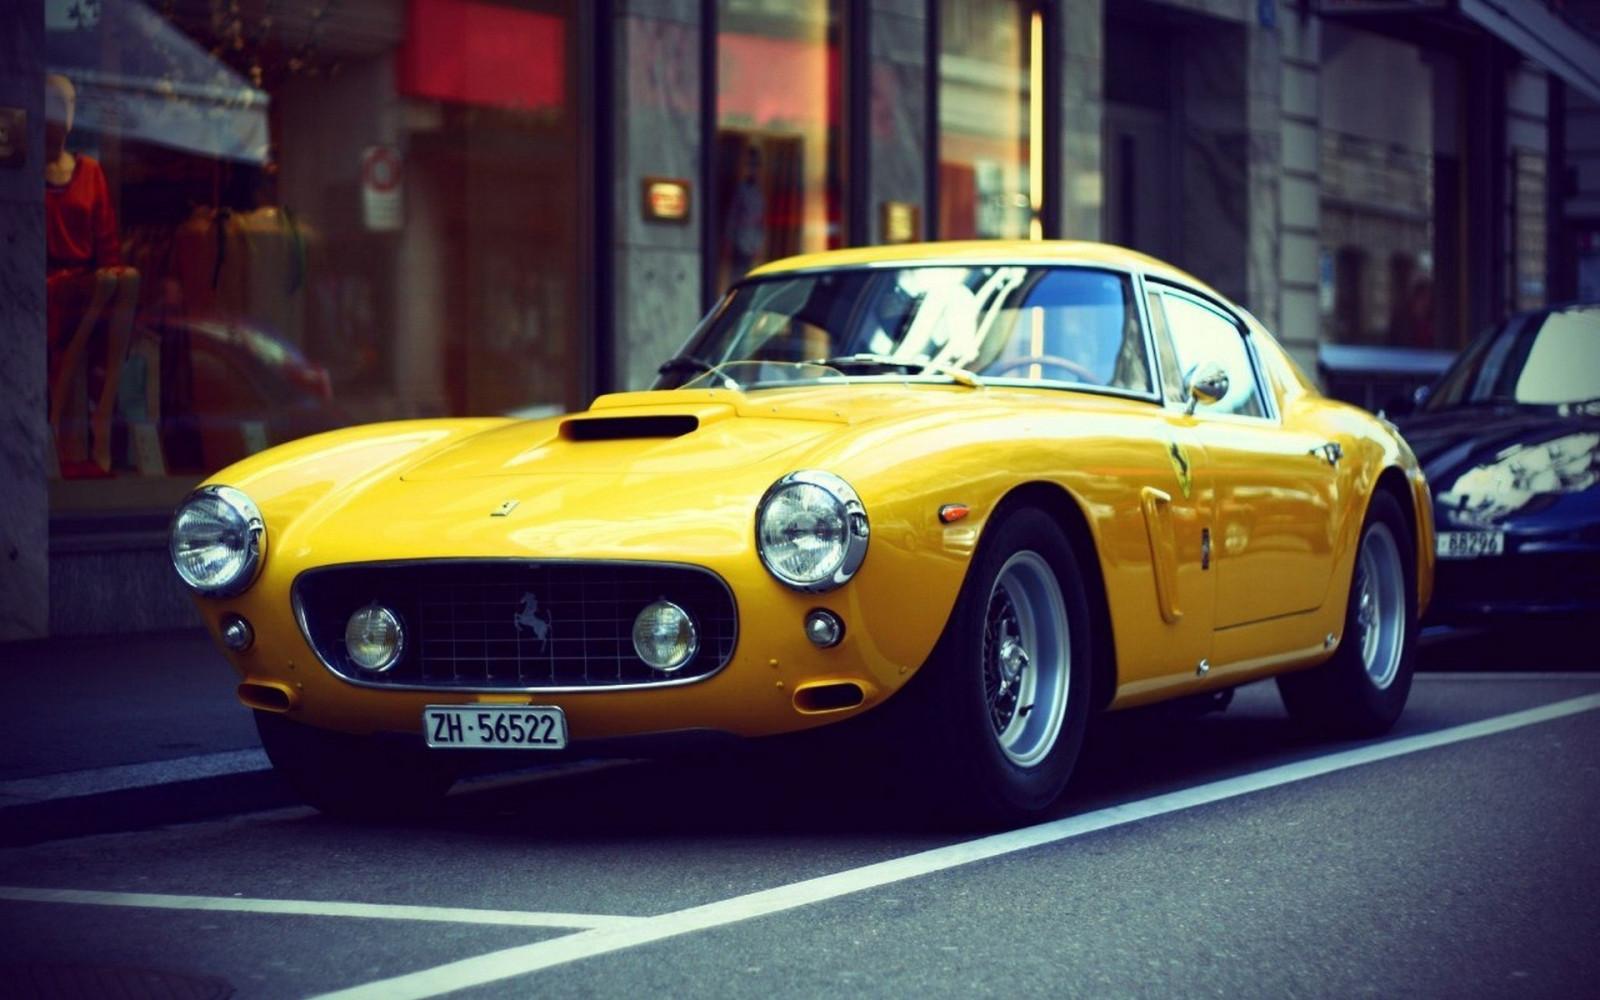 Wallpaper Vintage Sports Car Yellow Cars Classic Car Tvr Performance Car Ferrari 250 Gto Ferrari 250 Supercar Land Vehicle Automotive Design Race Car Automobile Make Antique Car Ferrari Spa 1920x1200